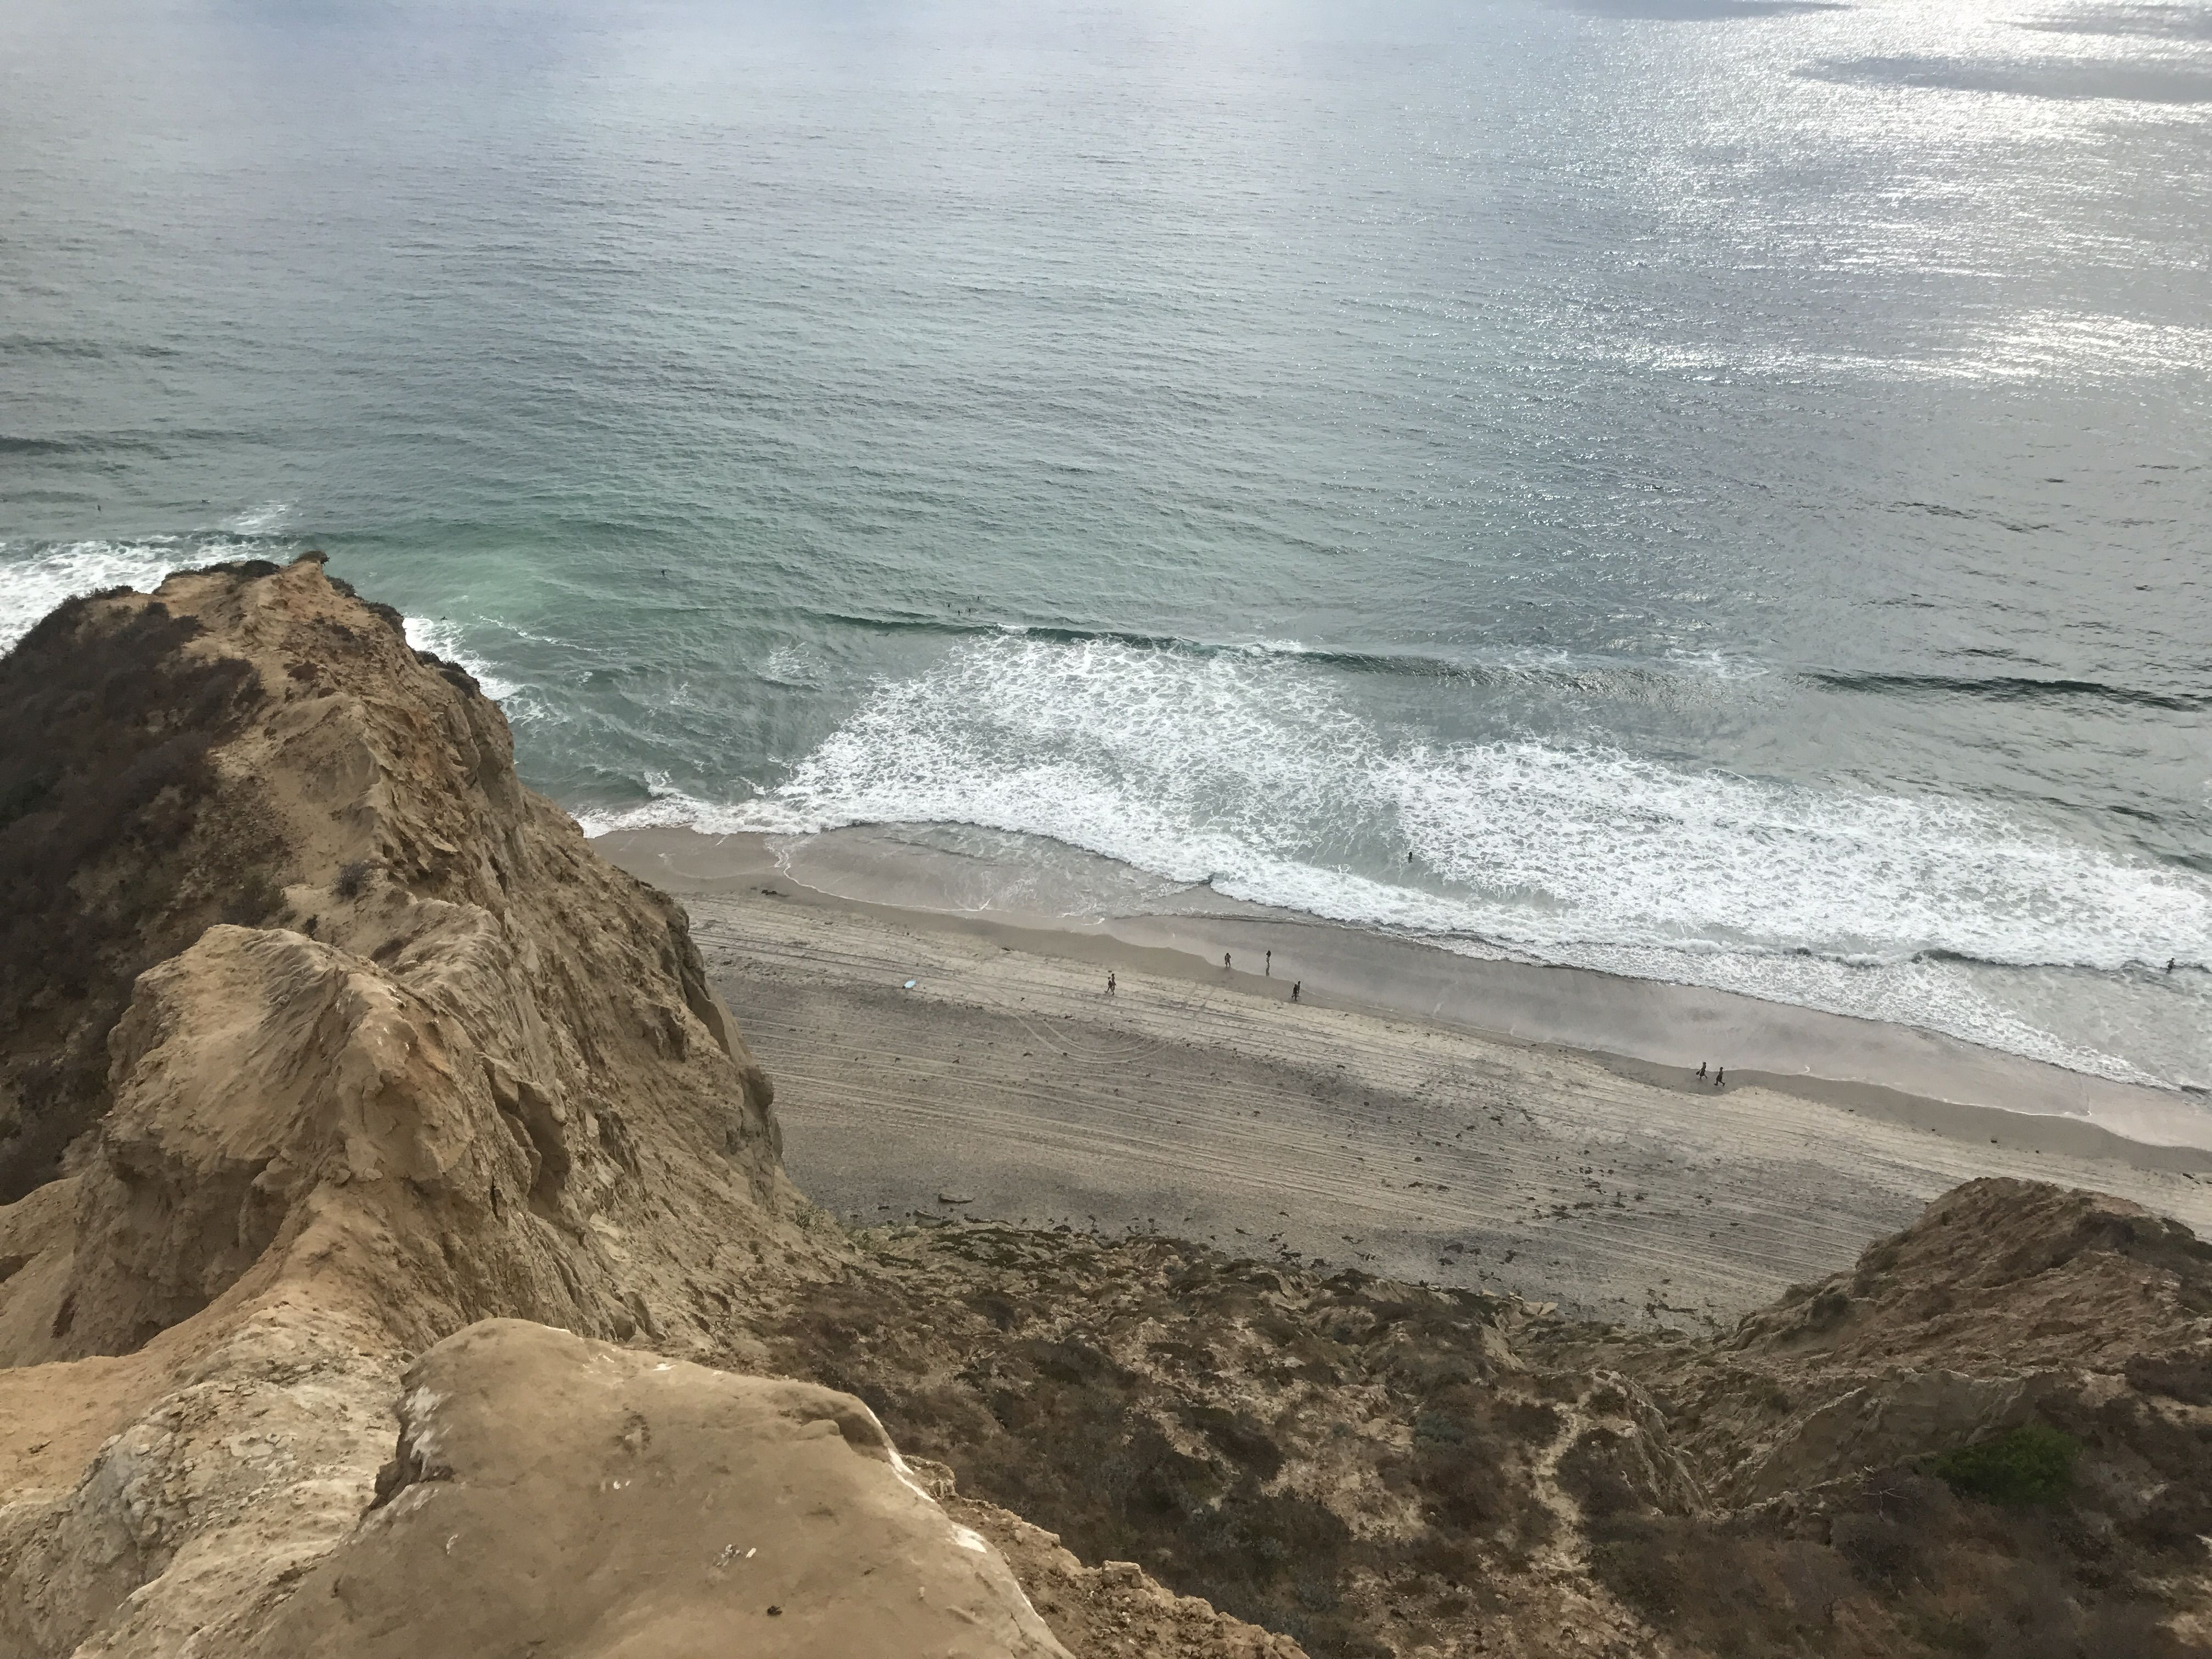 Blacks Beach - La Jolla, California - Clothing-Optional